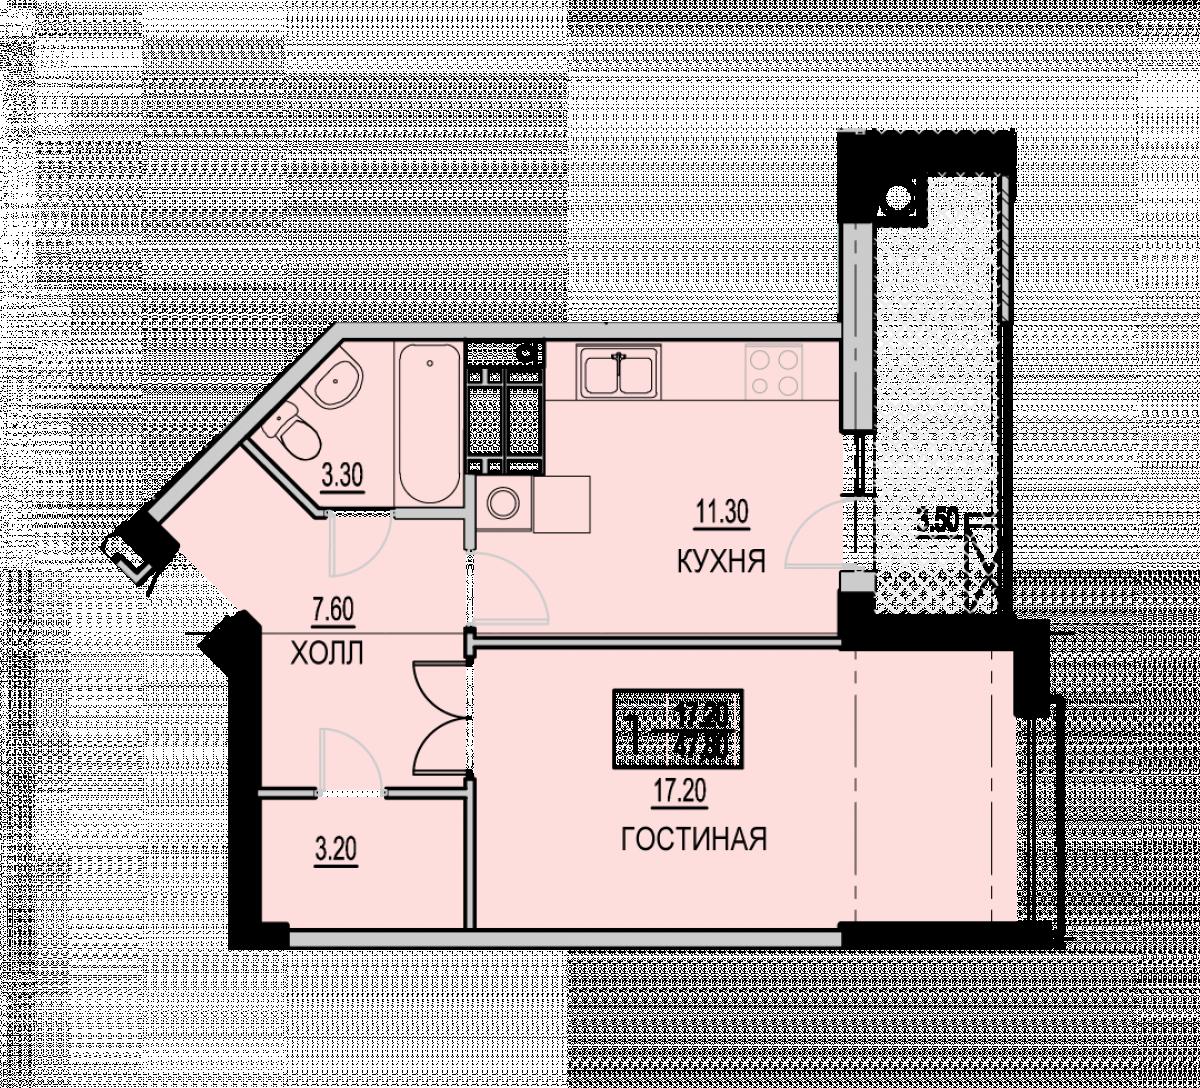 Bulevardul Dacia Residence Botanica-5